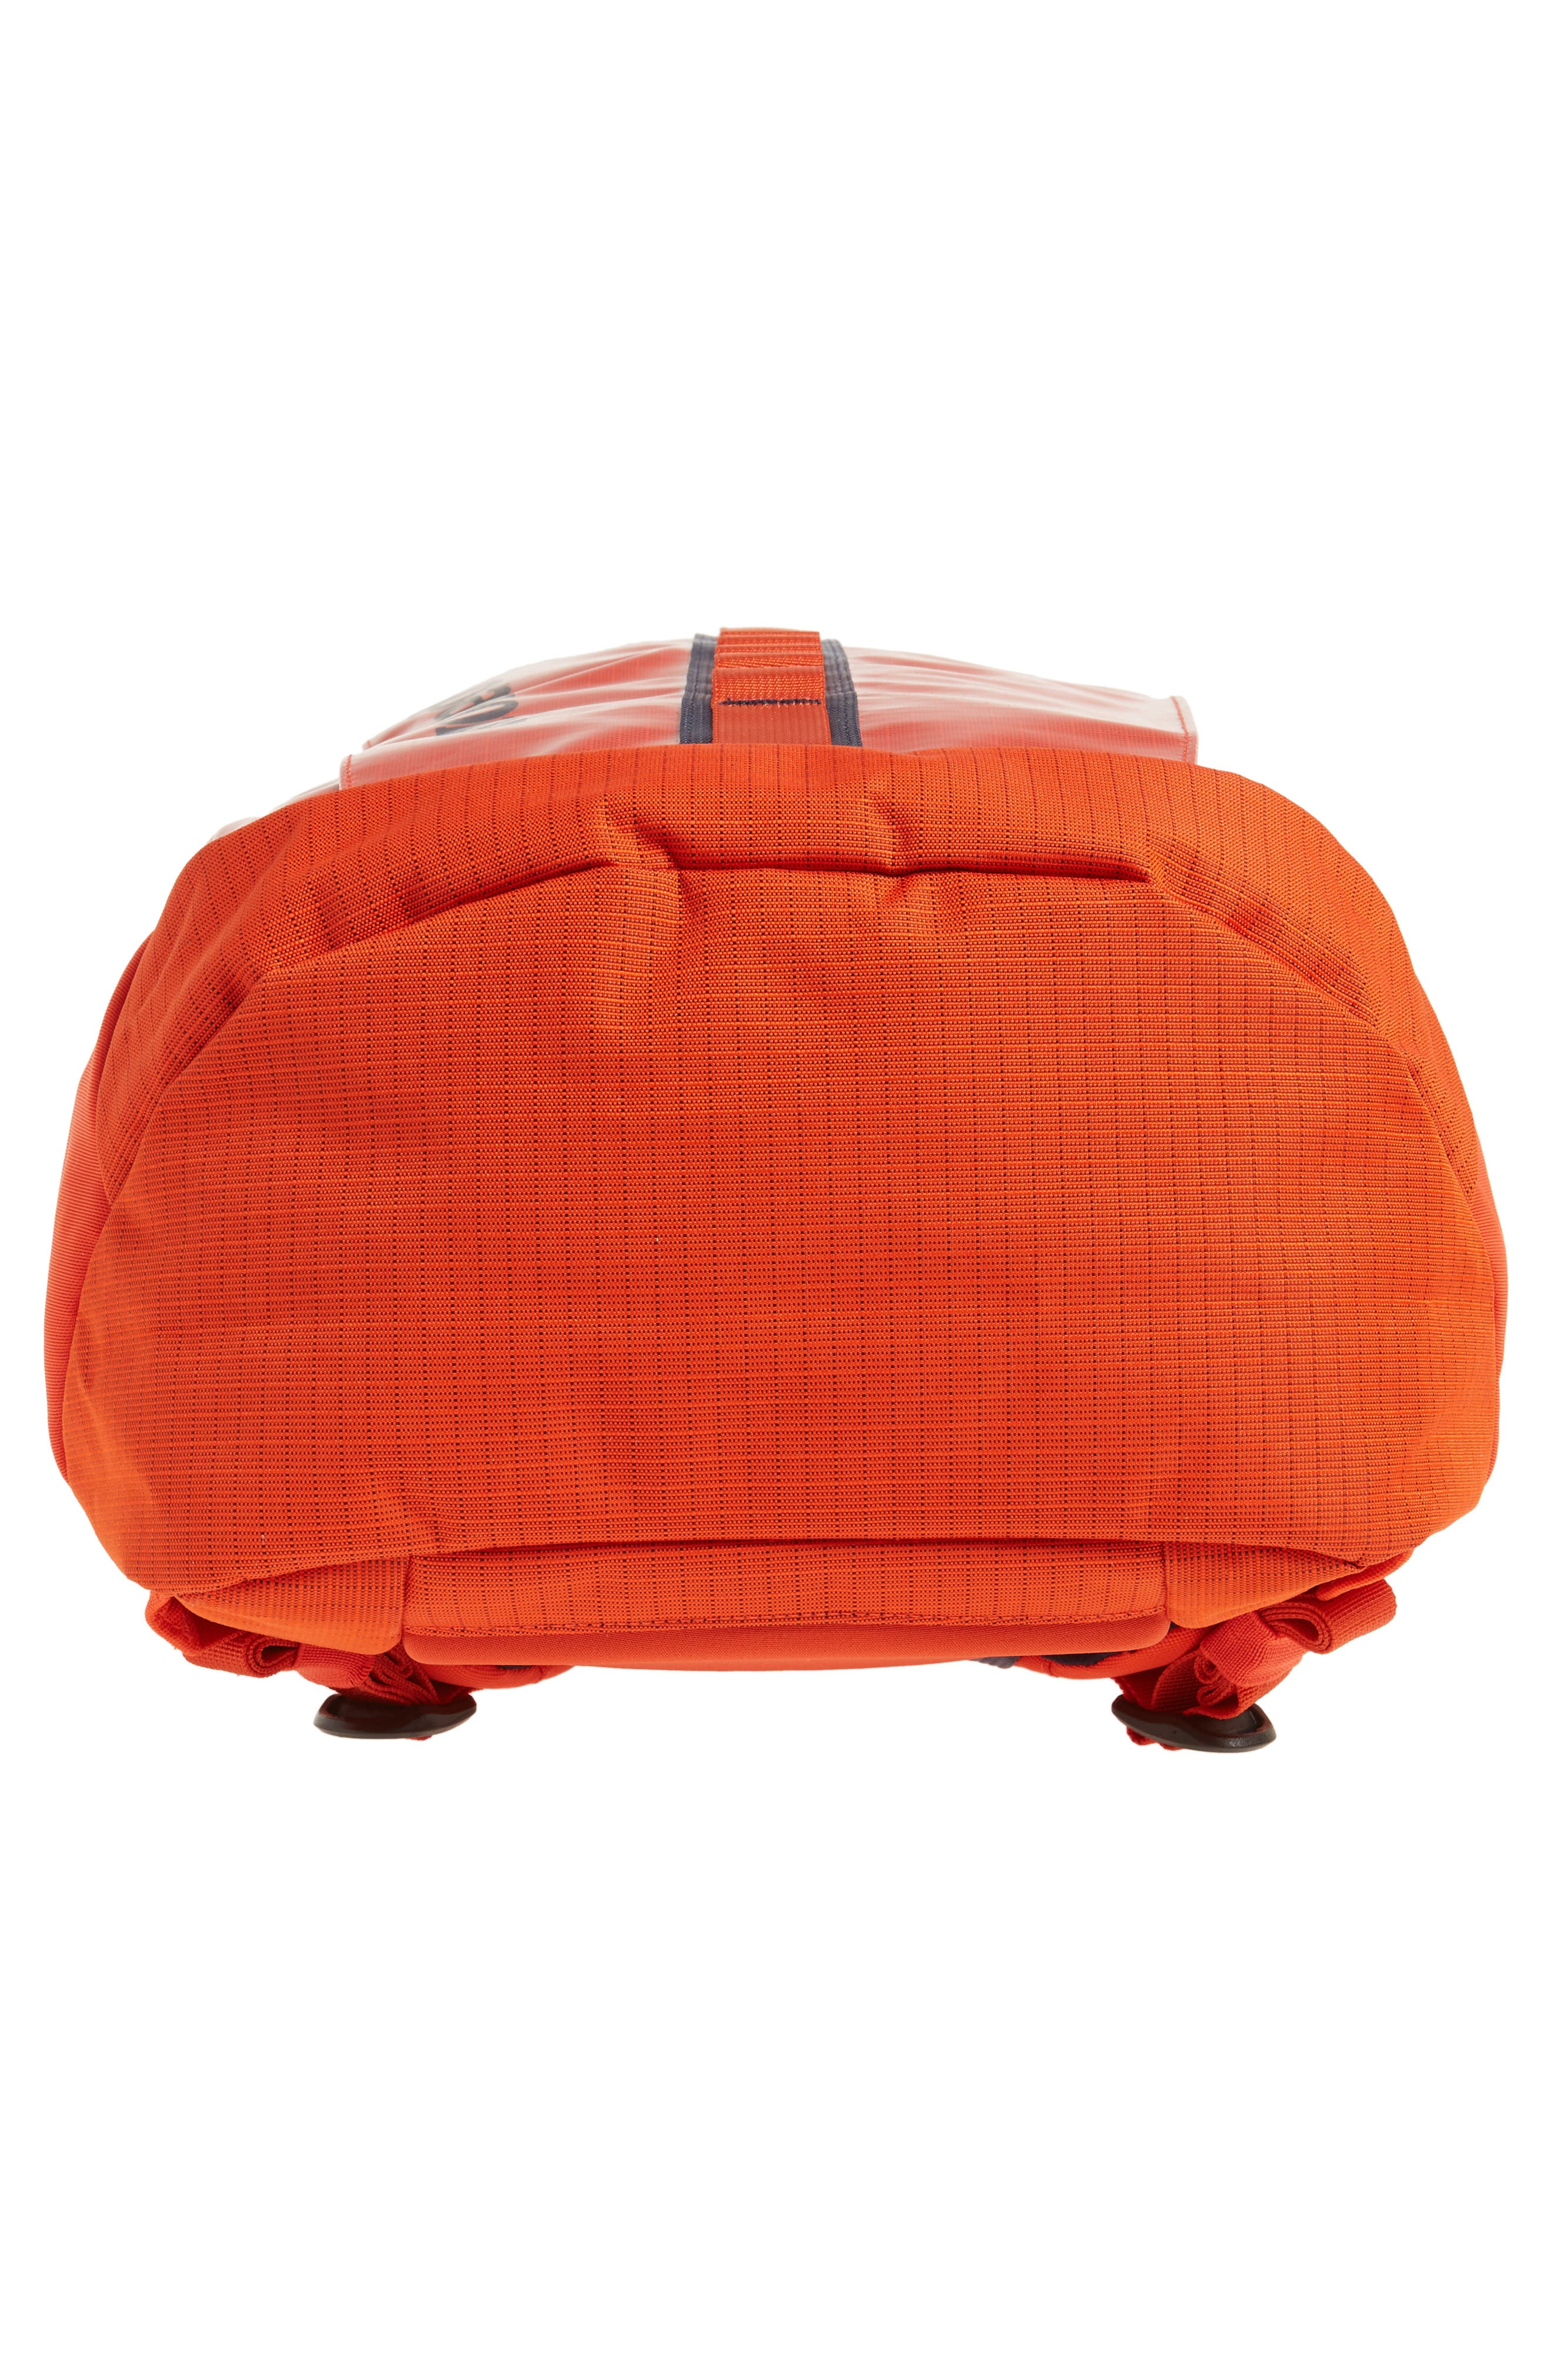 Black Hole 25 Liter Backpack,                             Alternate thumbnail 6, color,                             PAINTBRUSH RED